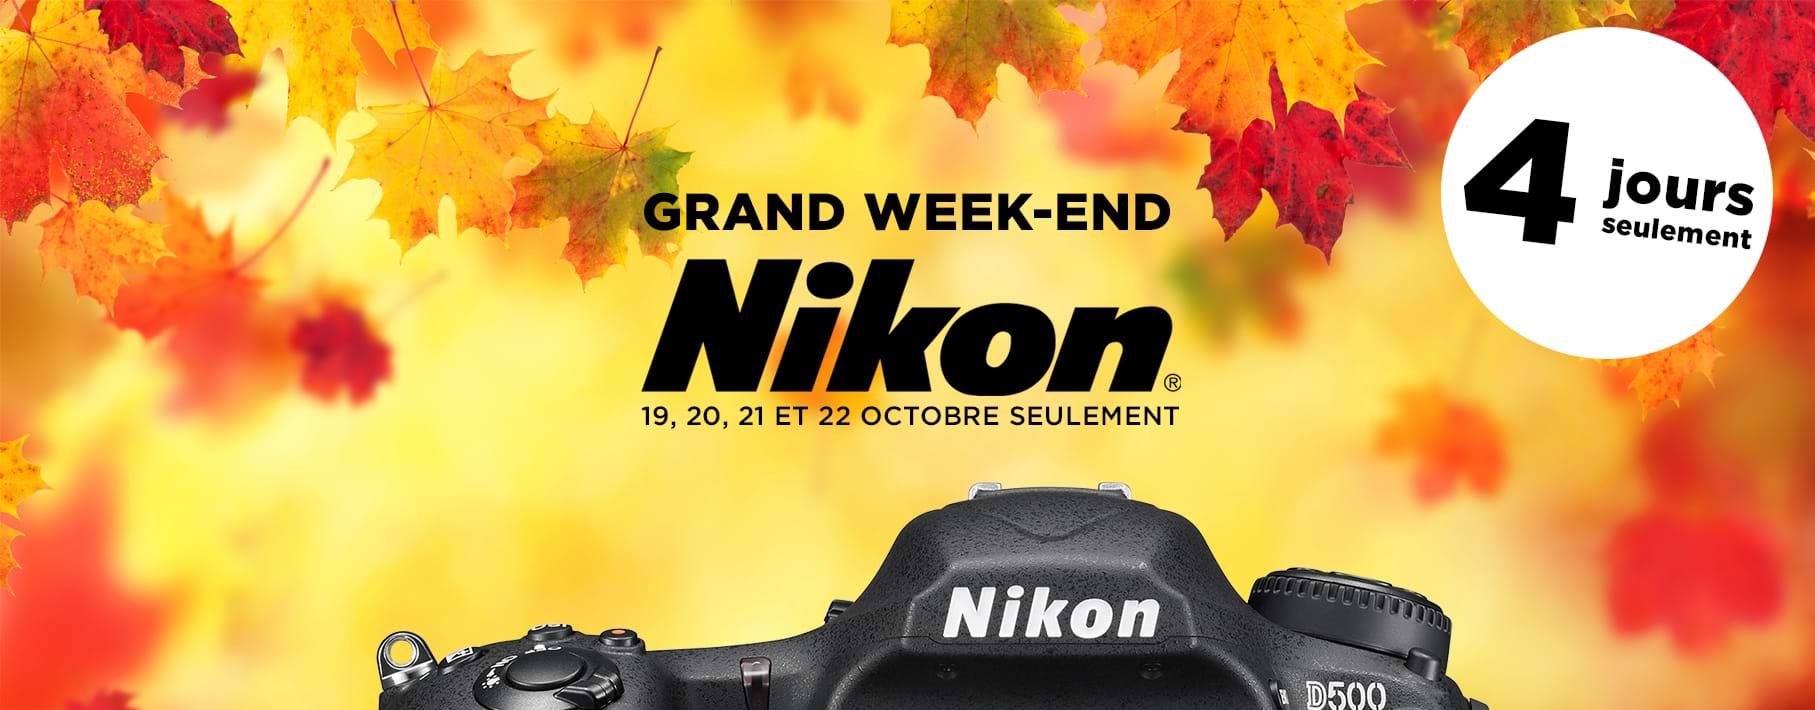 Week-end Nikon